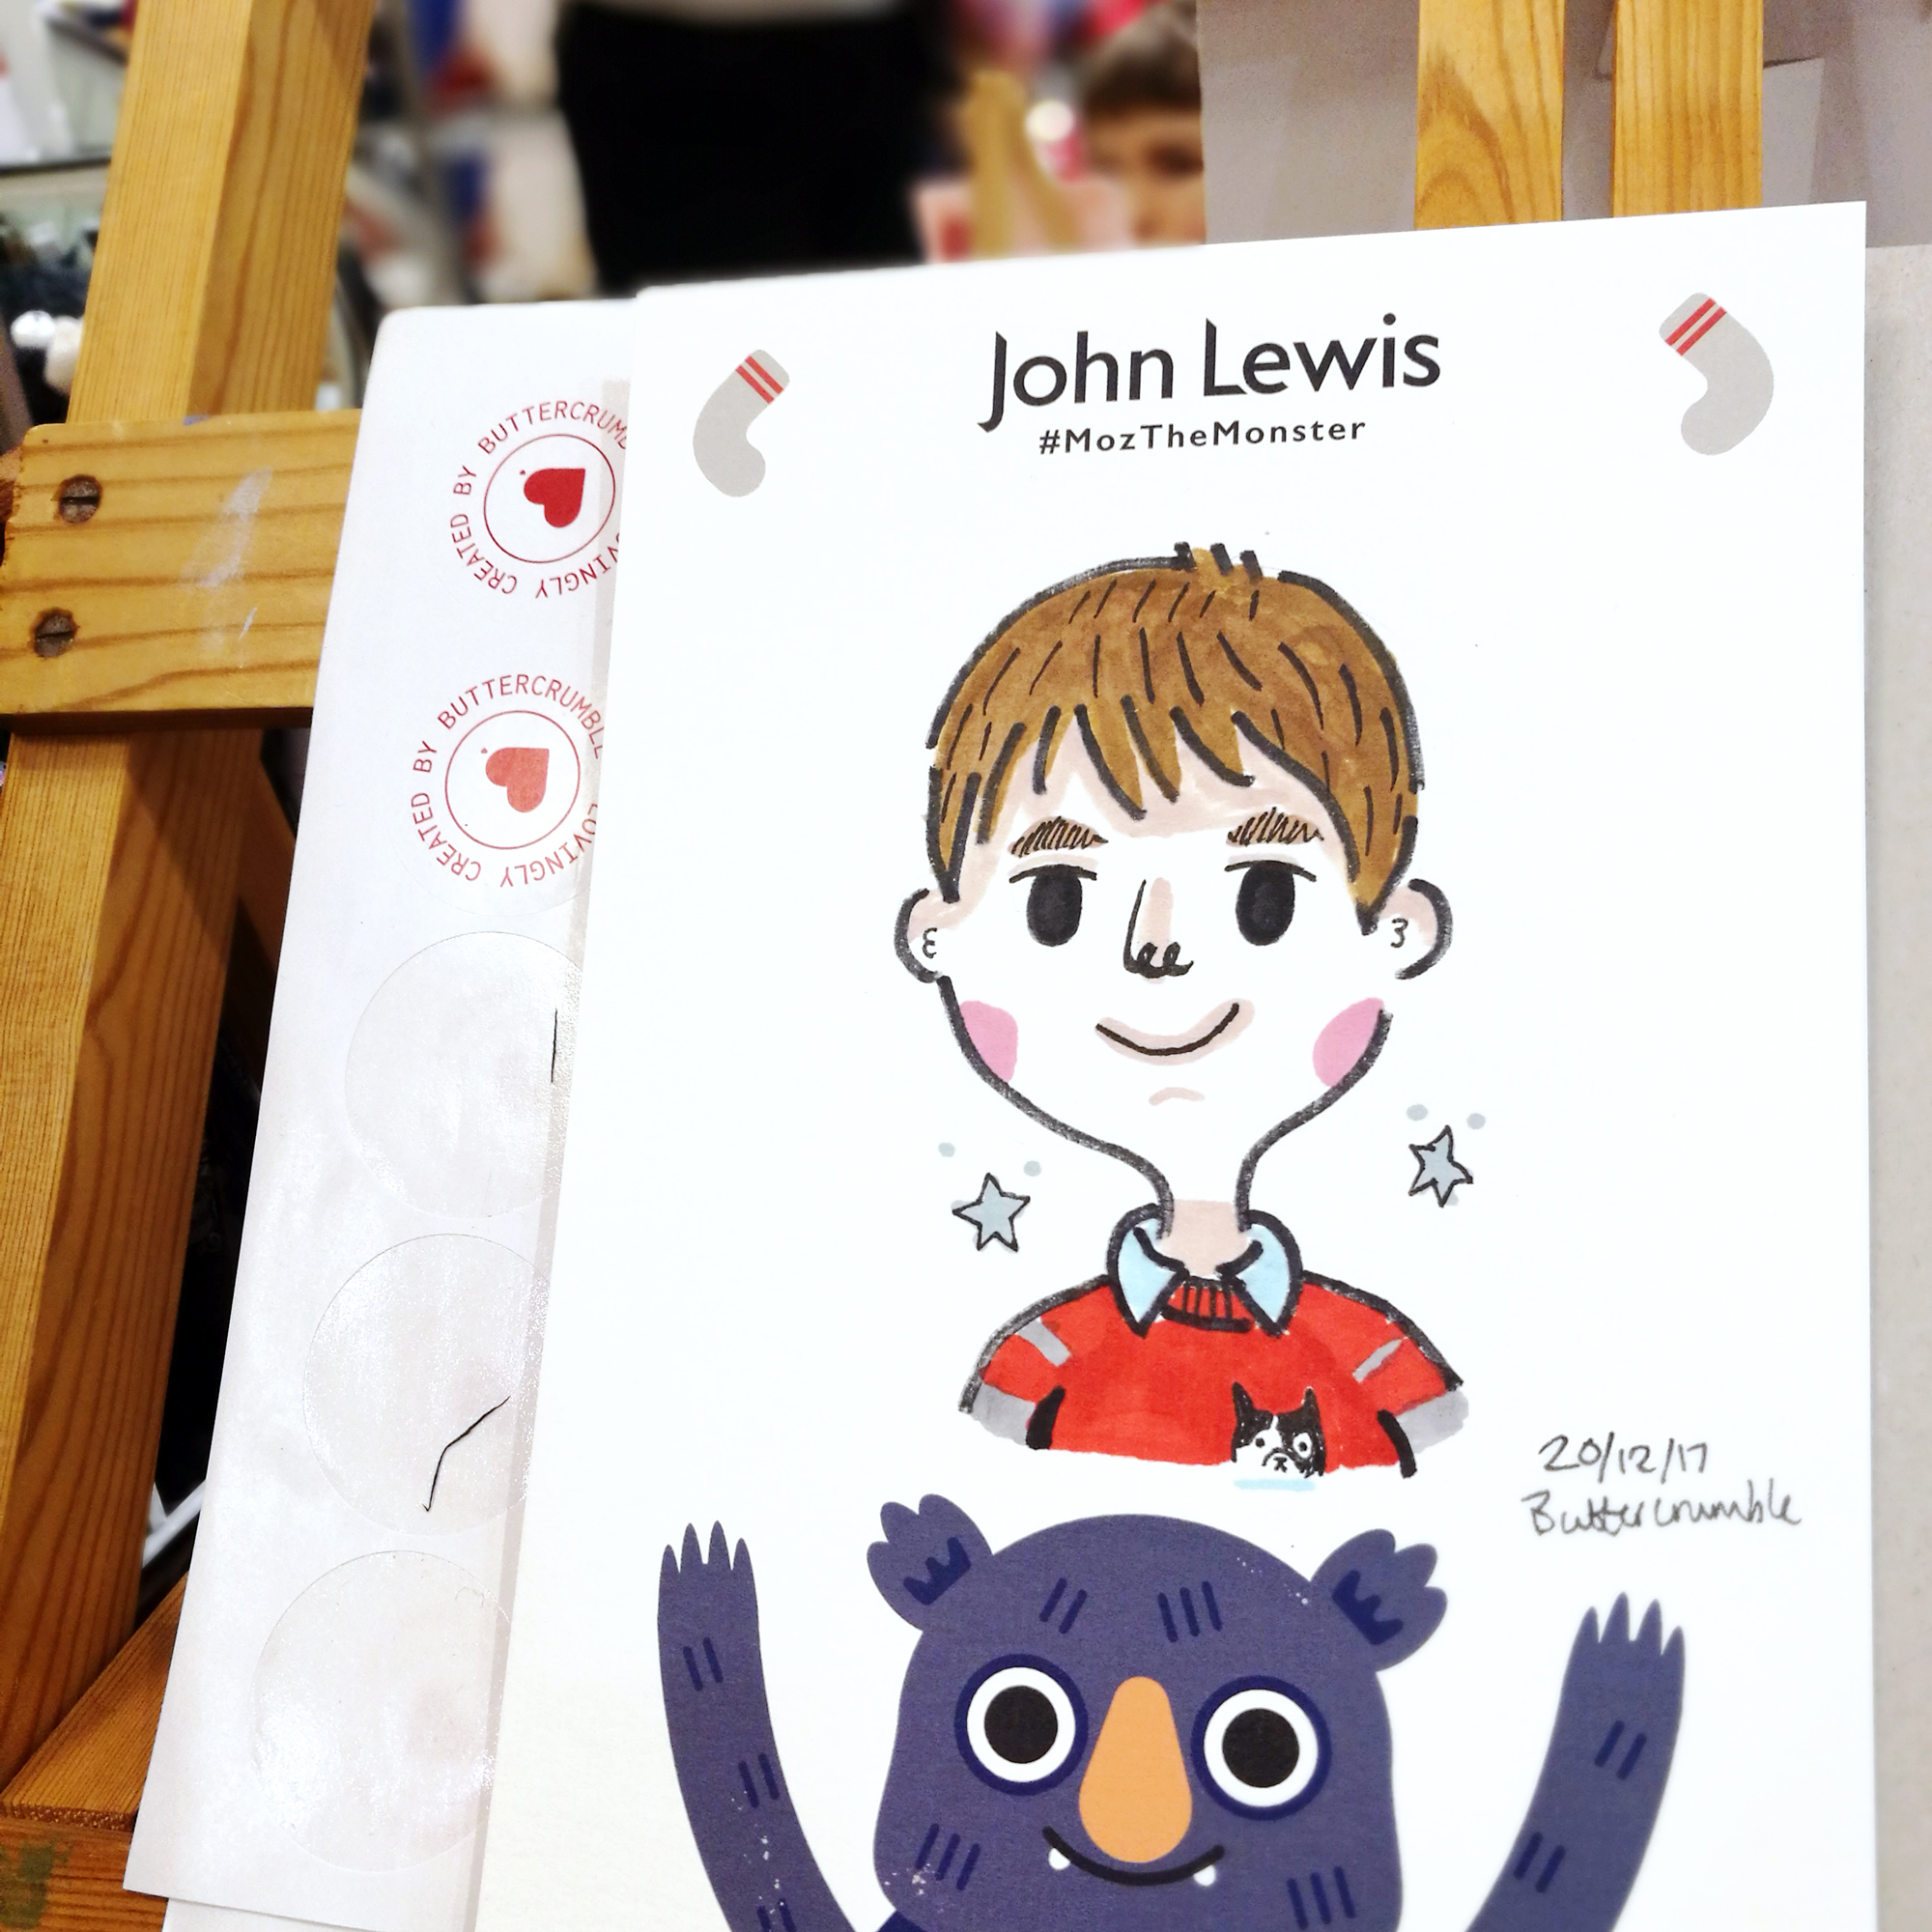 John-Lewis---Buttercrumble---Moz-the-Monster---Portrait-Example.jpg